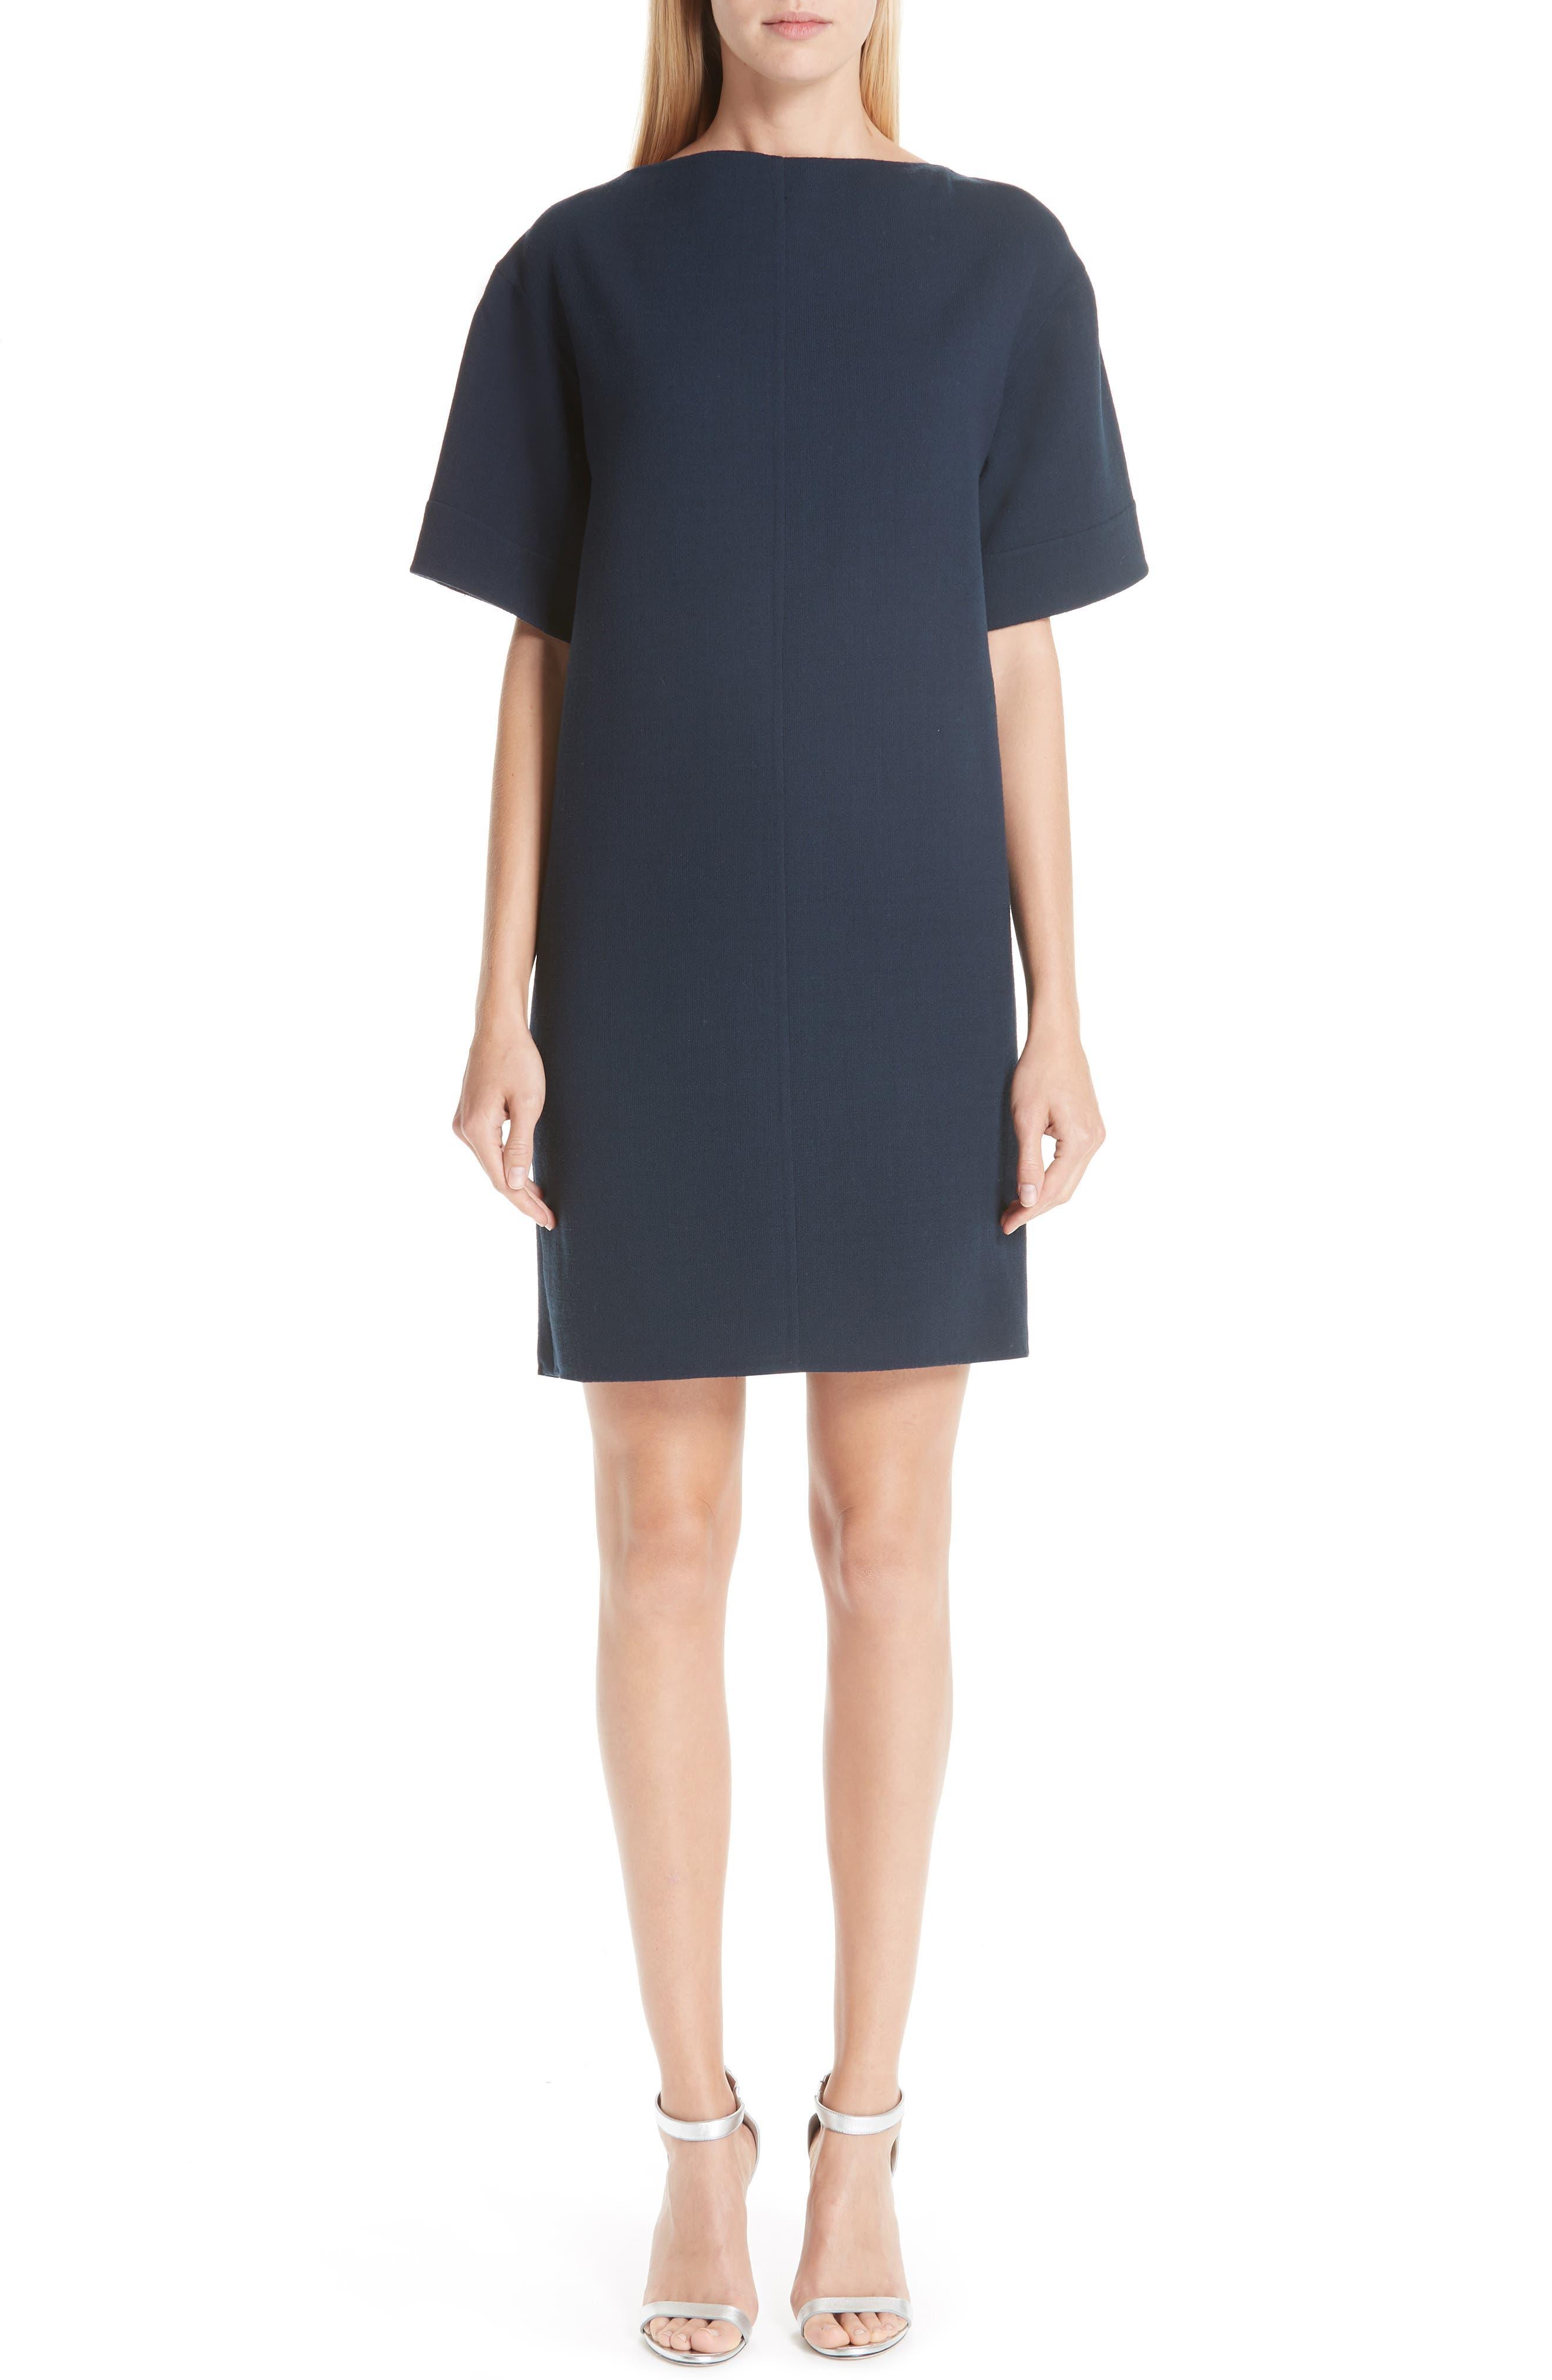 Oscar De La Renta Bow Back Stretch Wool Shift Dress, Blue